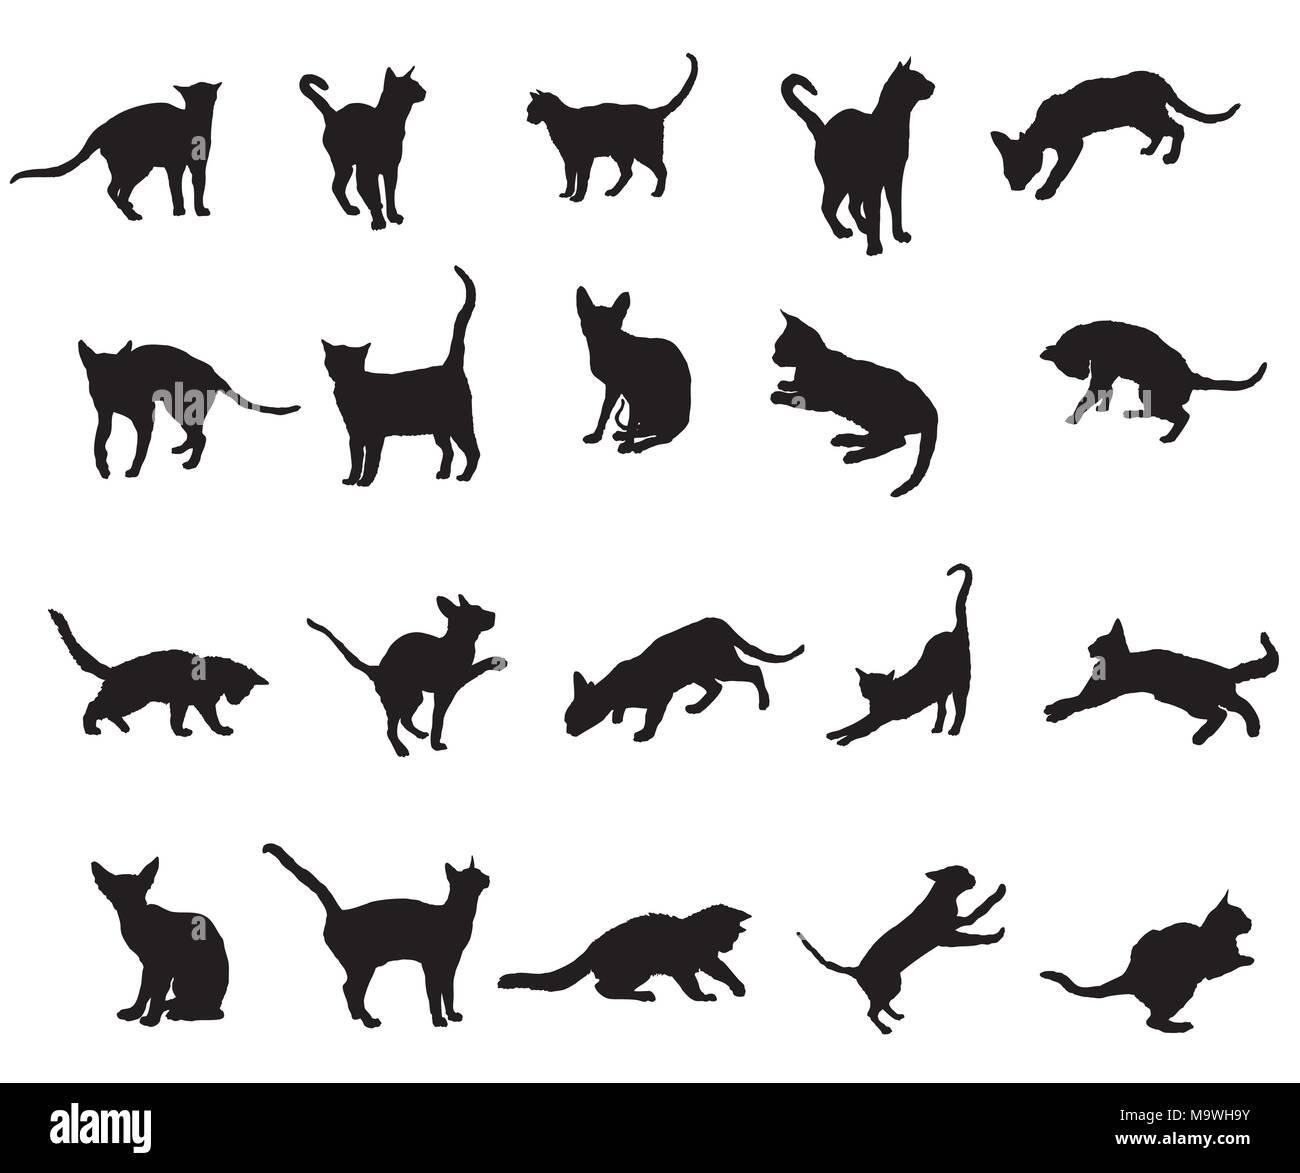 Conjunto De Diferentes Razas De Gatos Siluetas Sentado De Pie